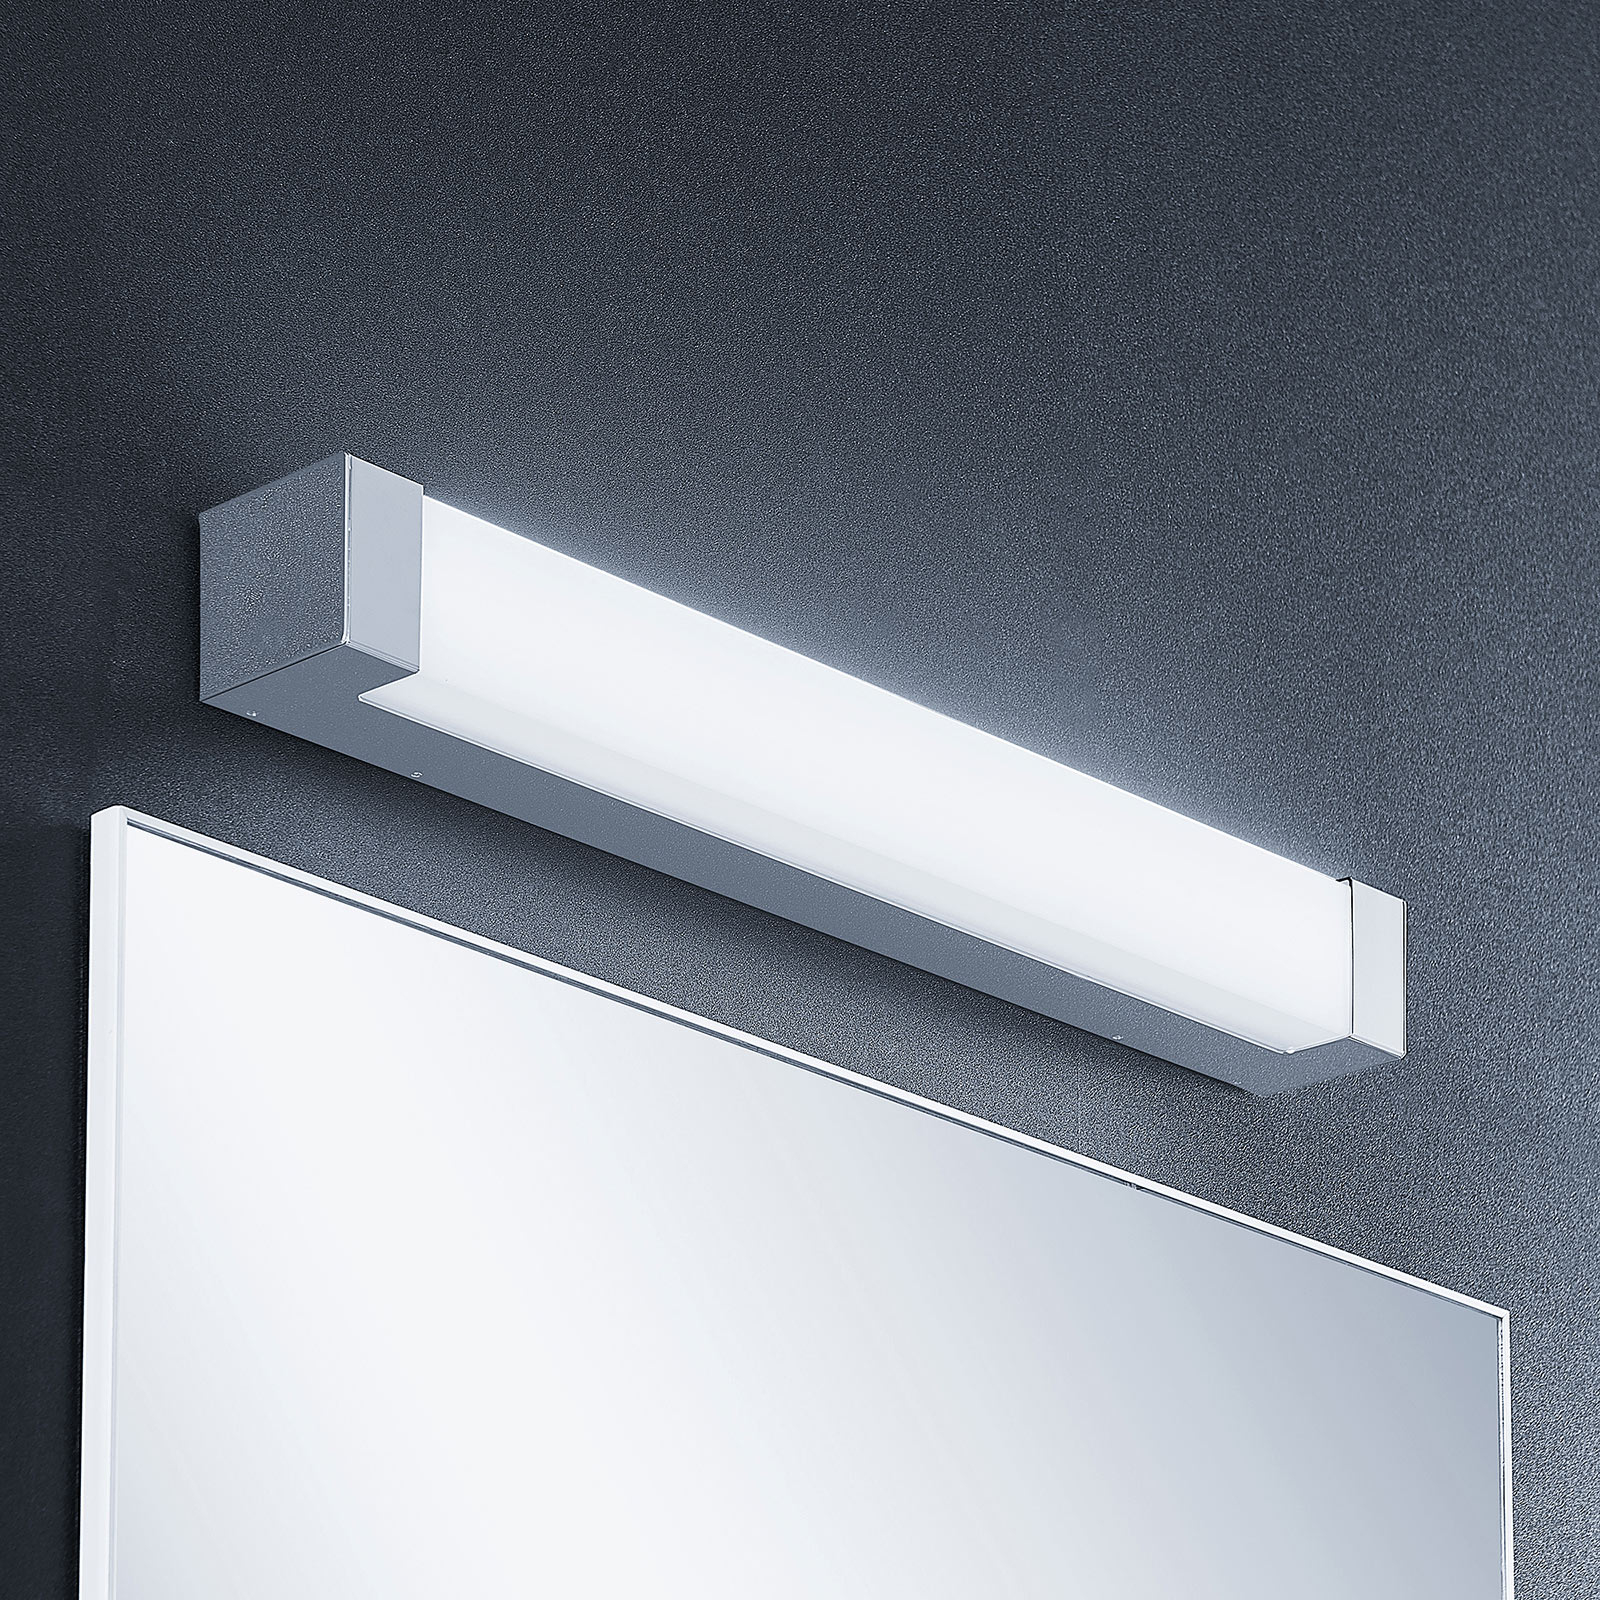 Lindby Skara -LED-kylpyhuonelamppu, 60 cm